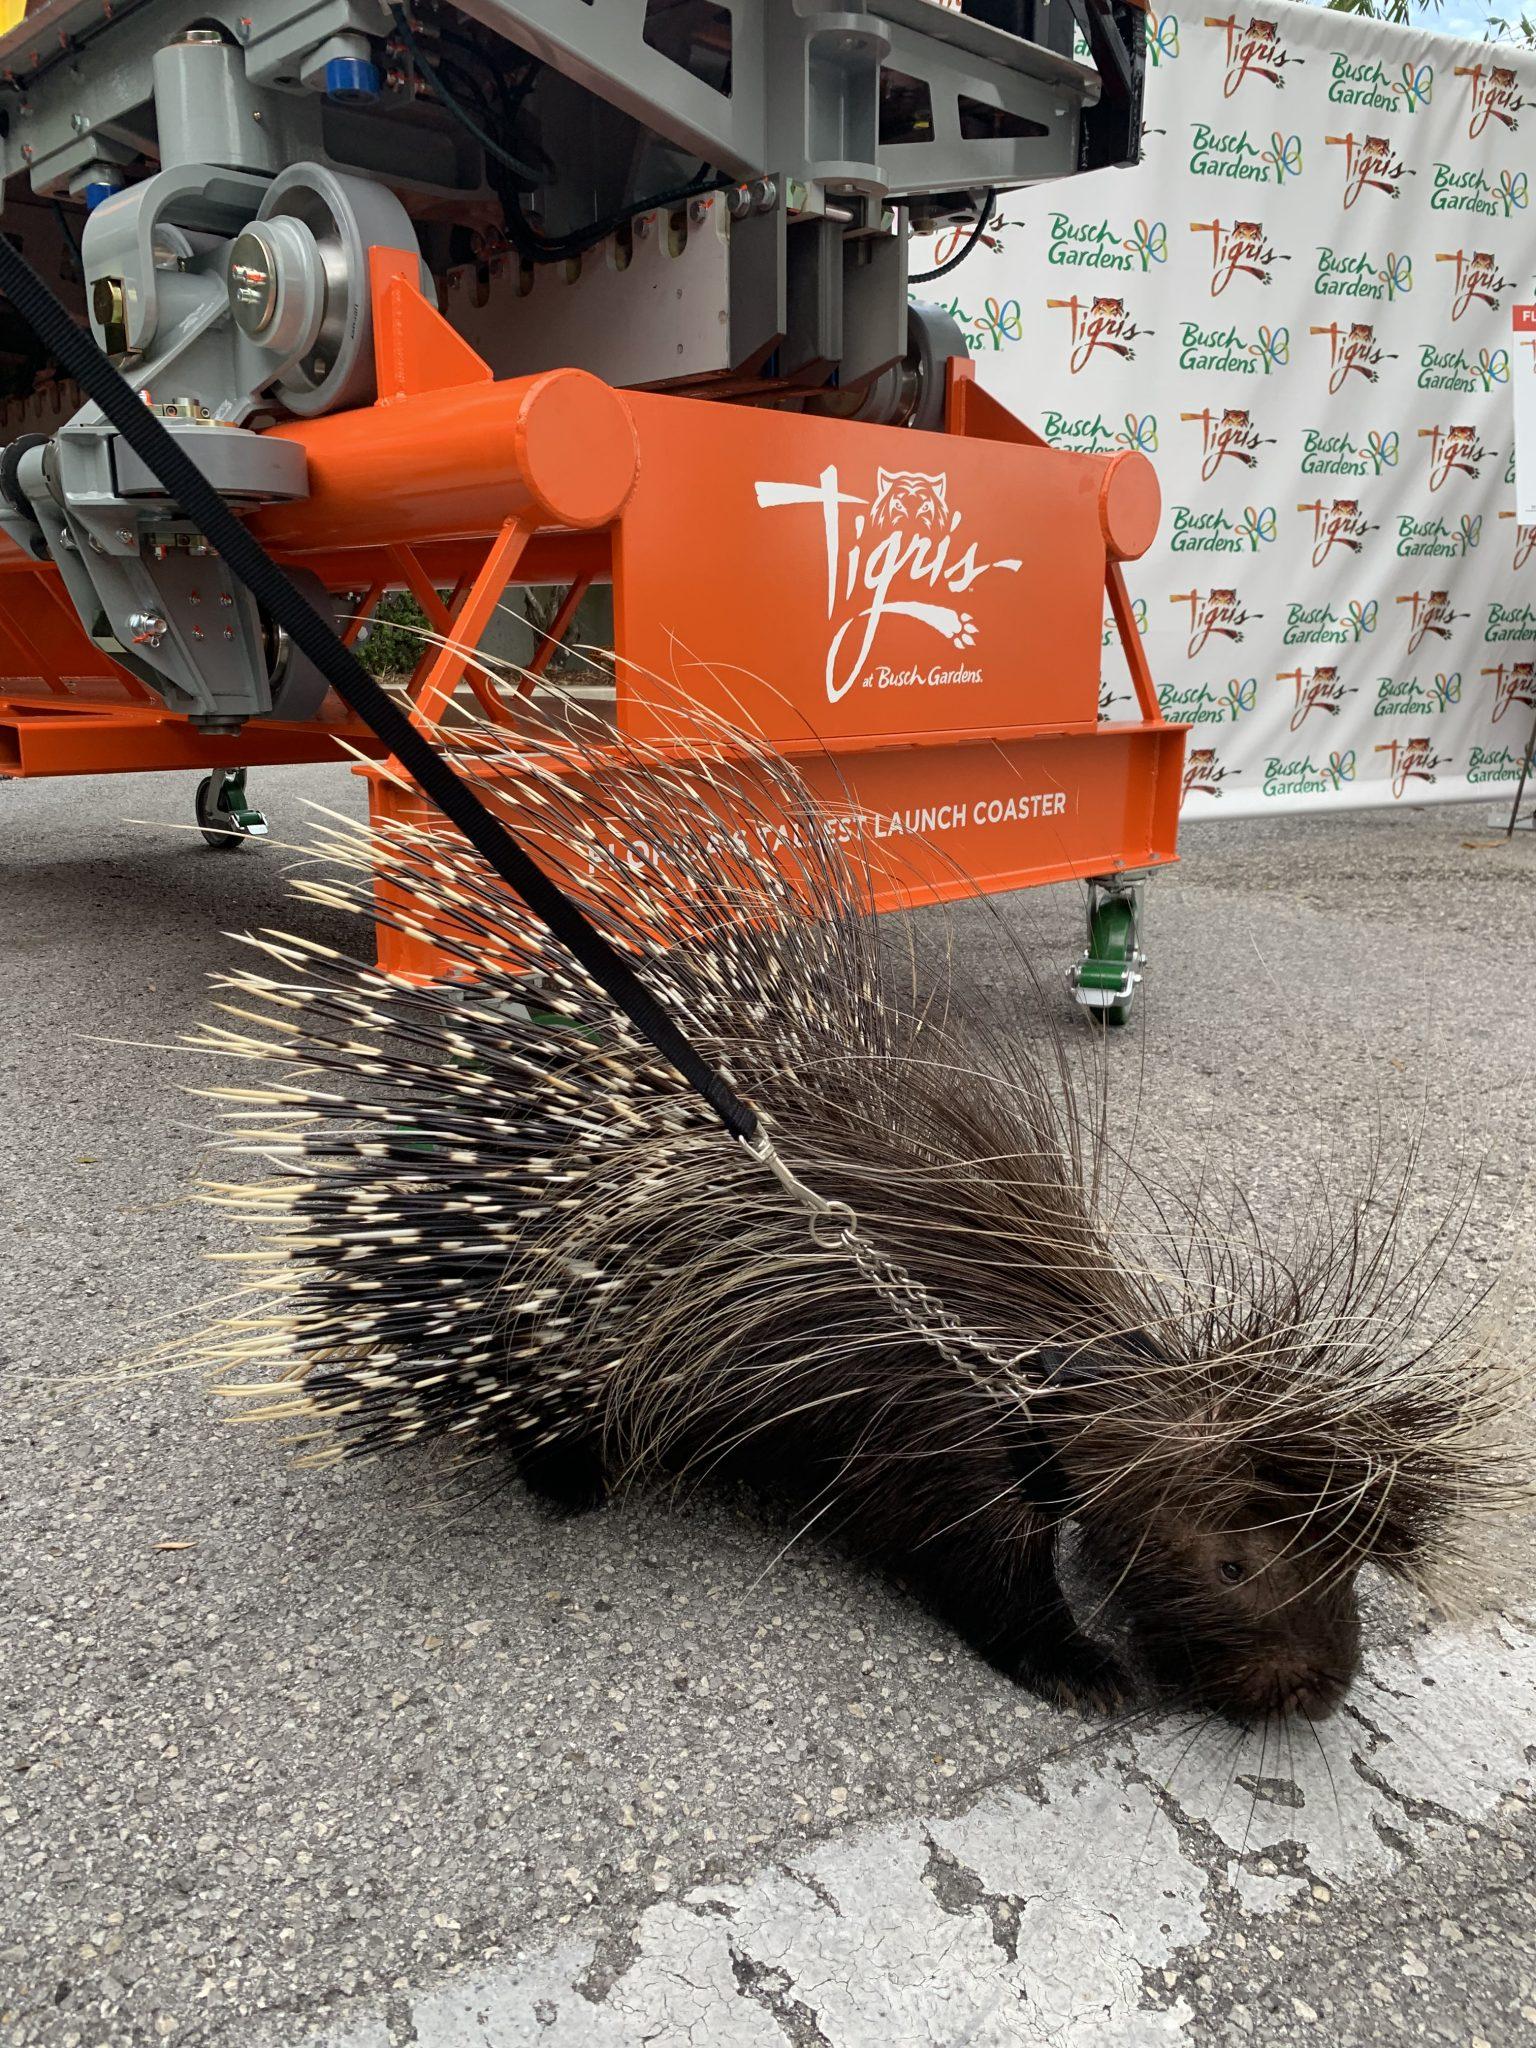 Kimami Busch Gardens Tampa Bay's porcupine